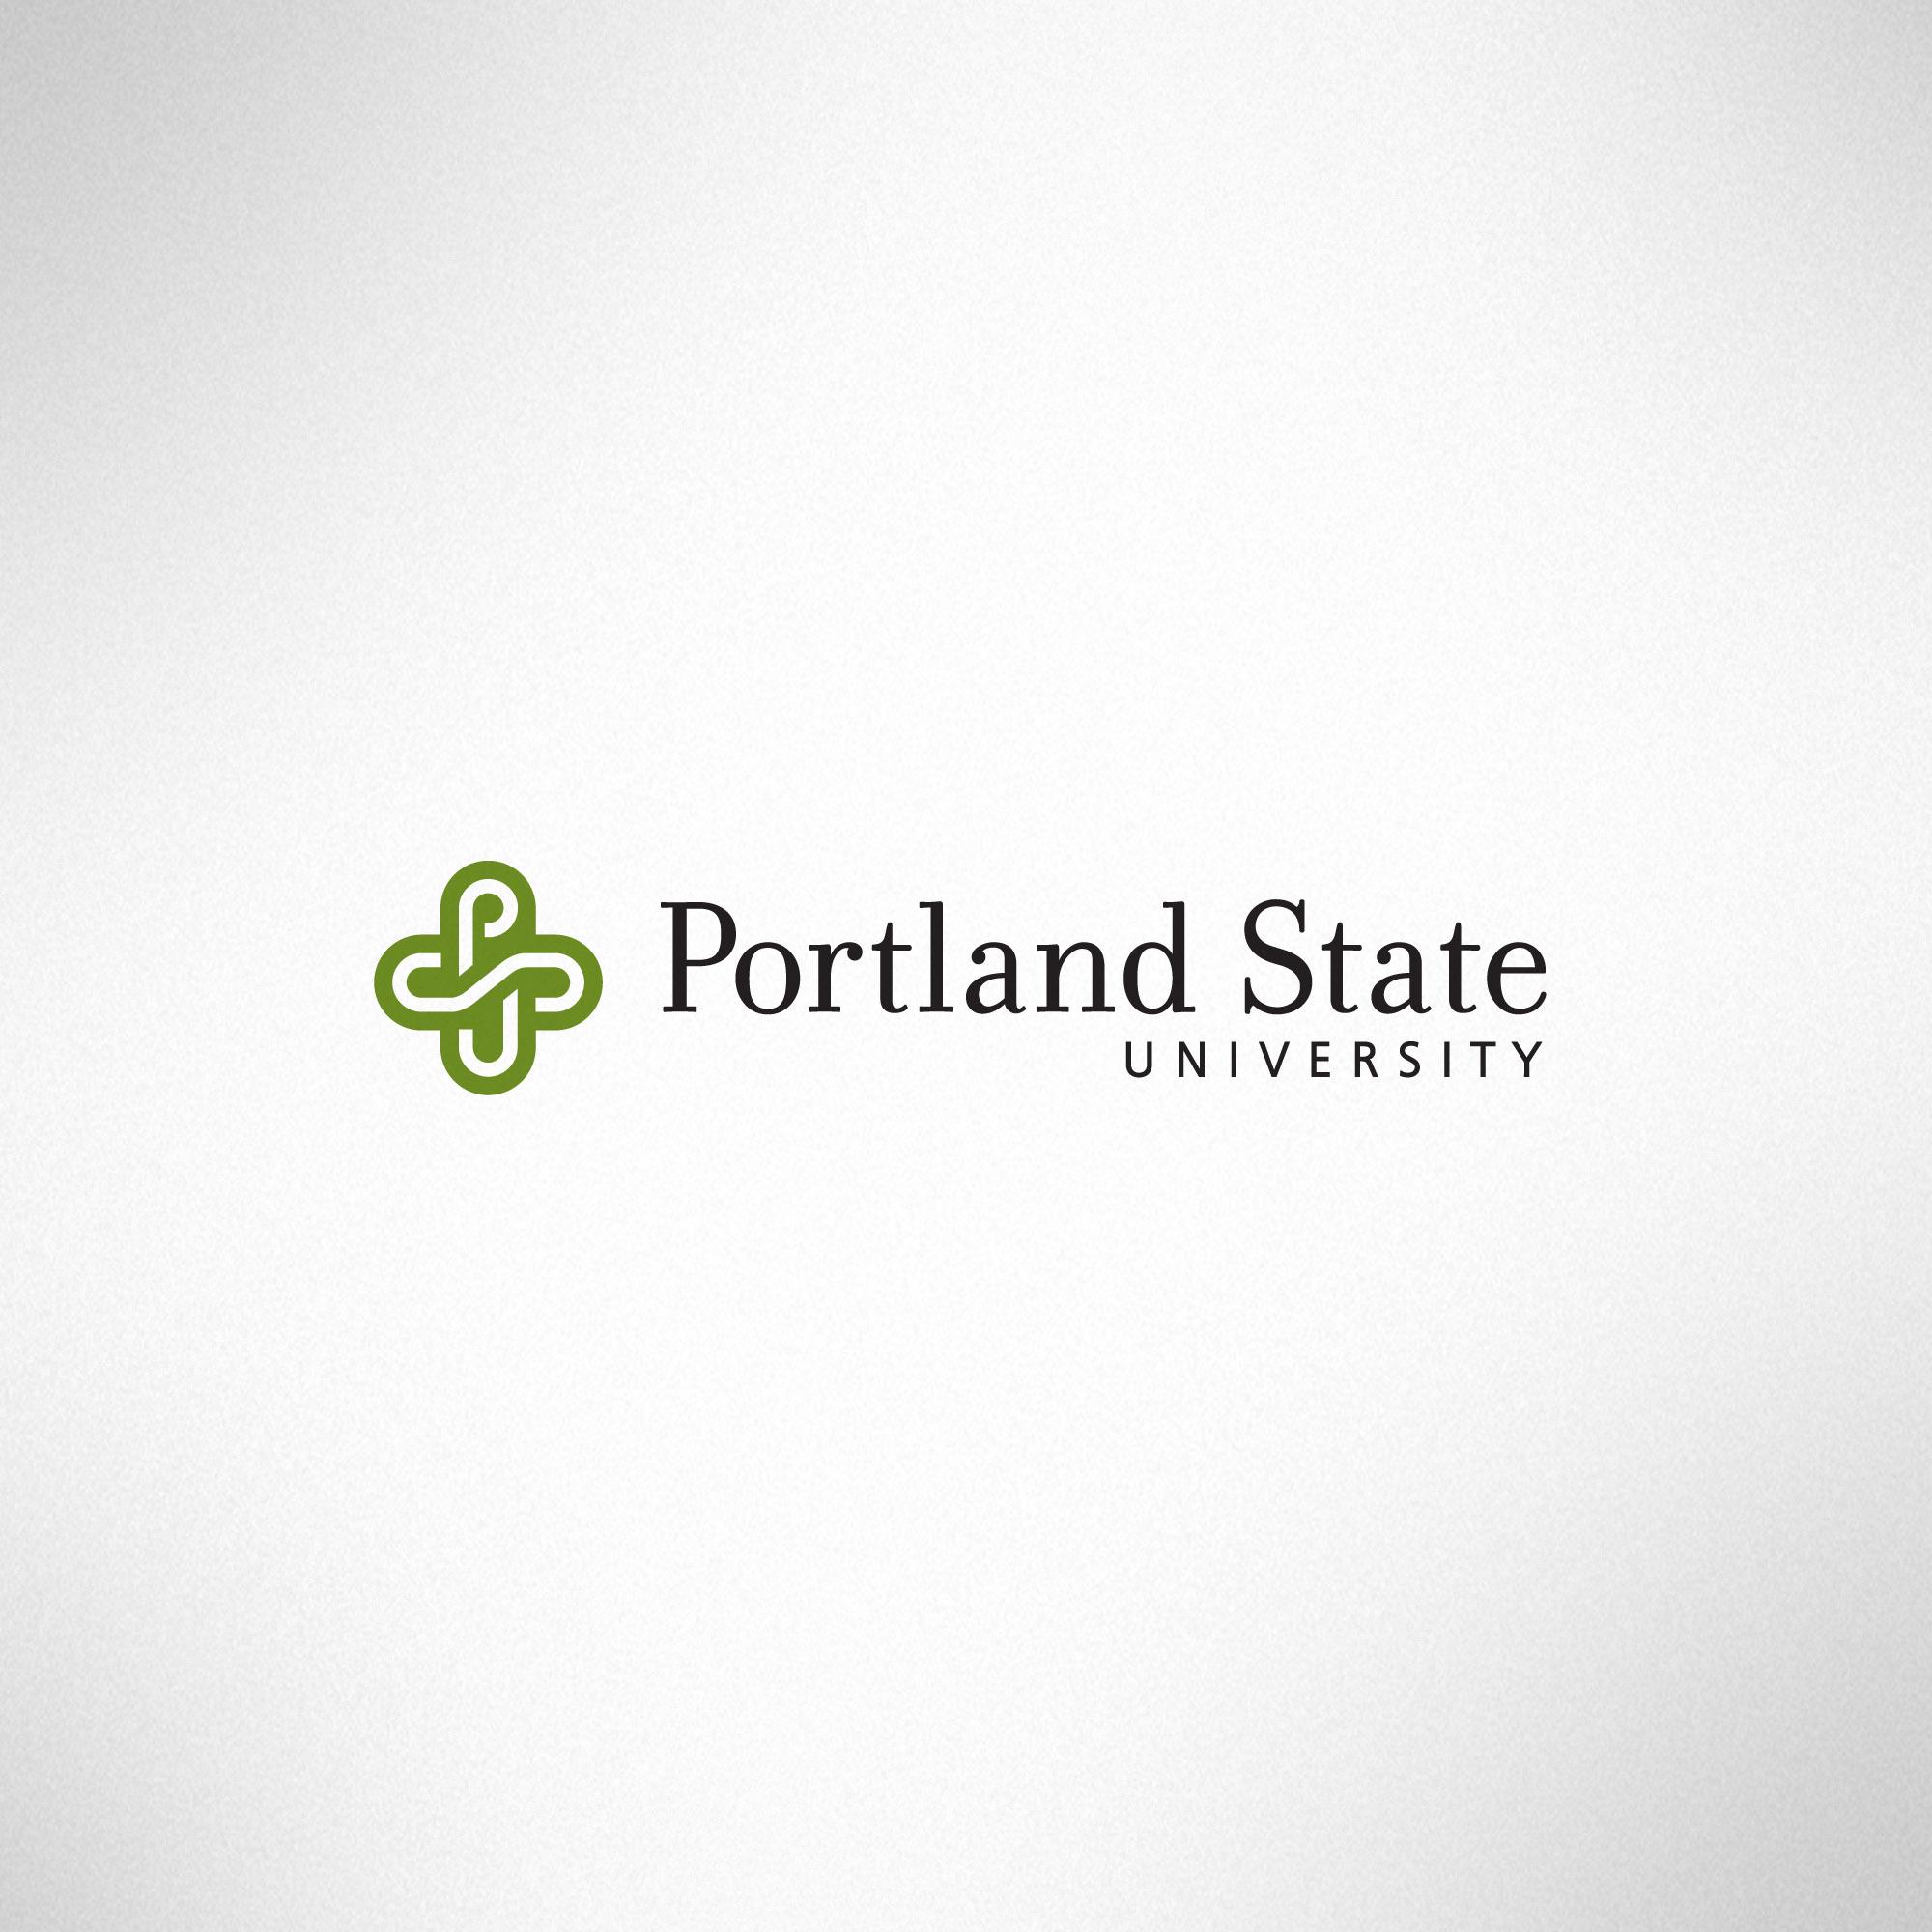 PSU_Logo_2.jpg